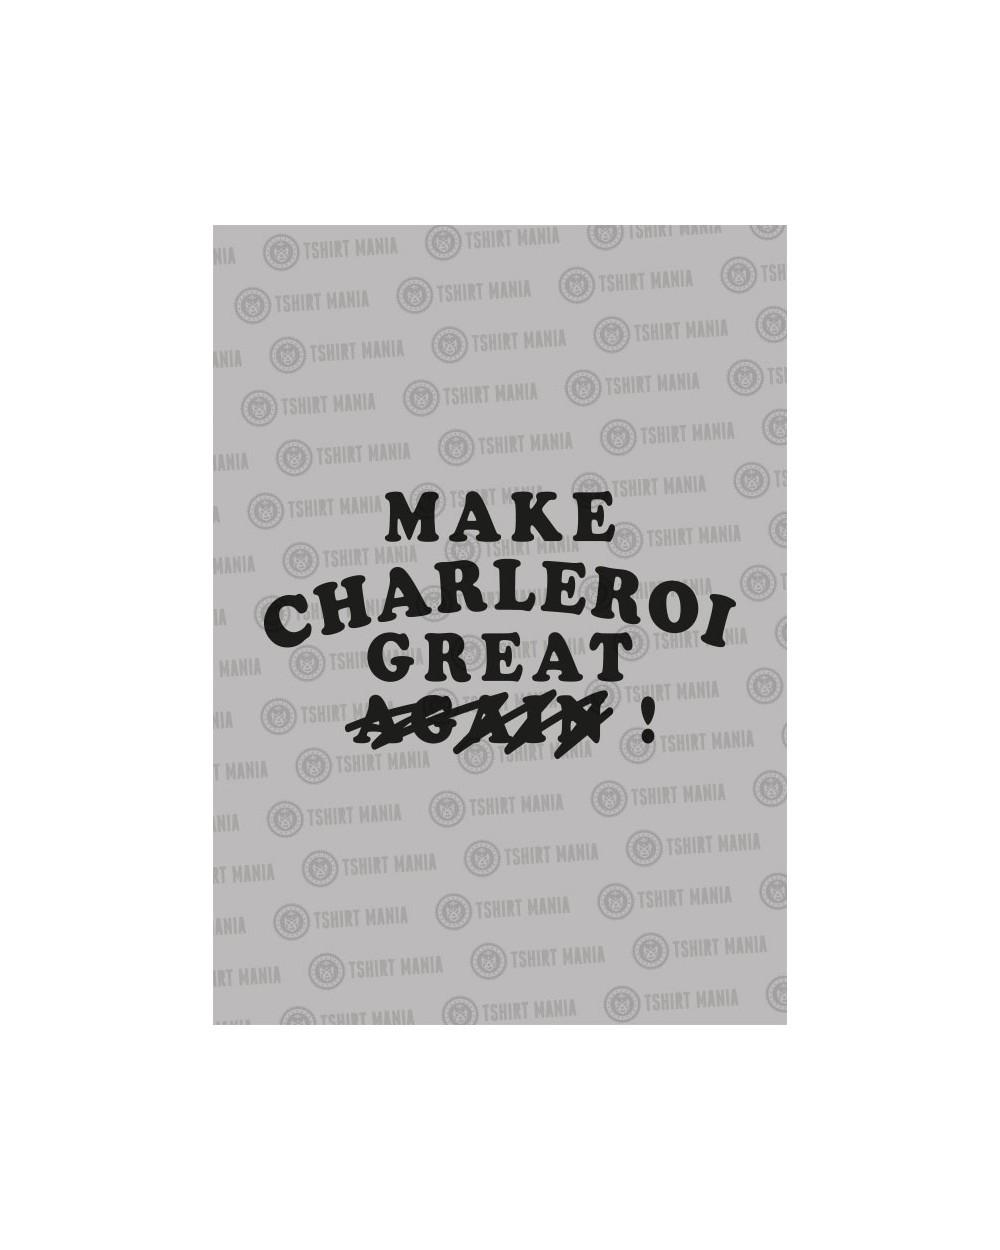 Make Charleroi great